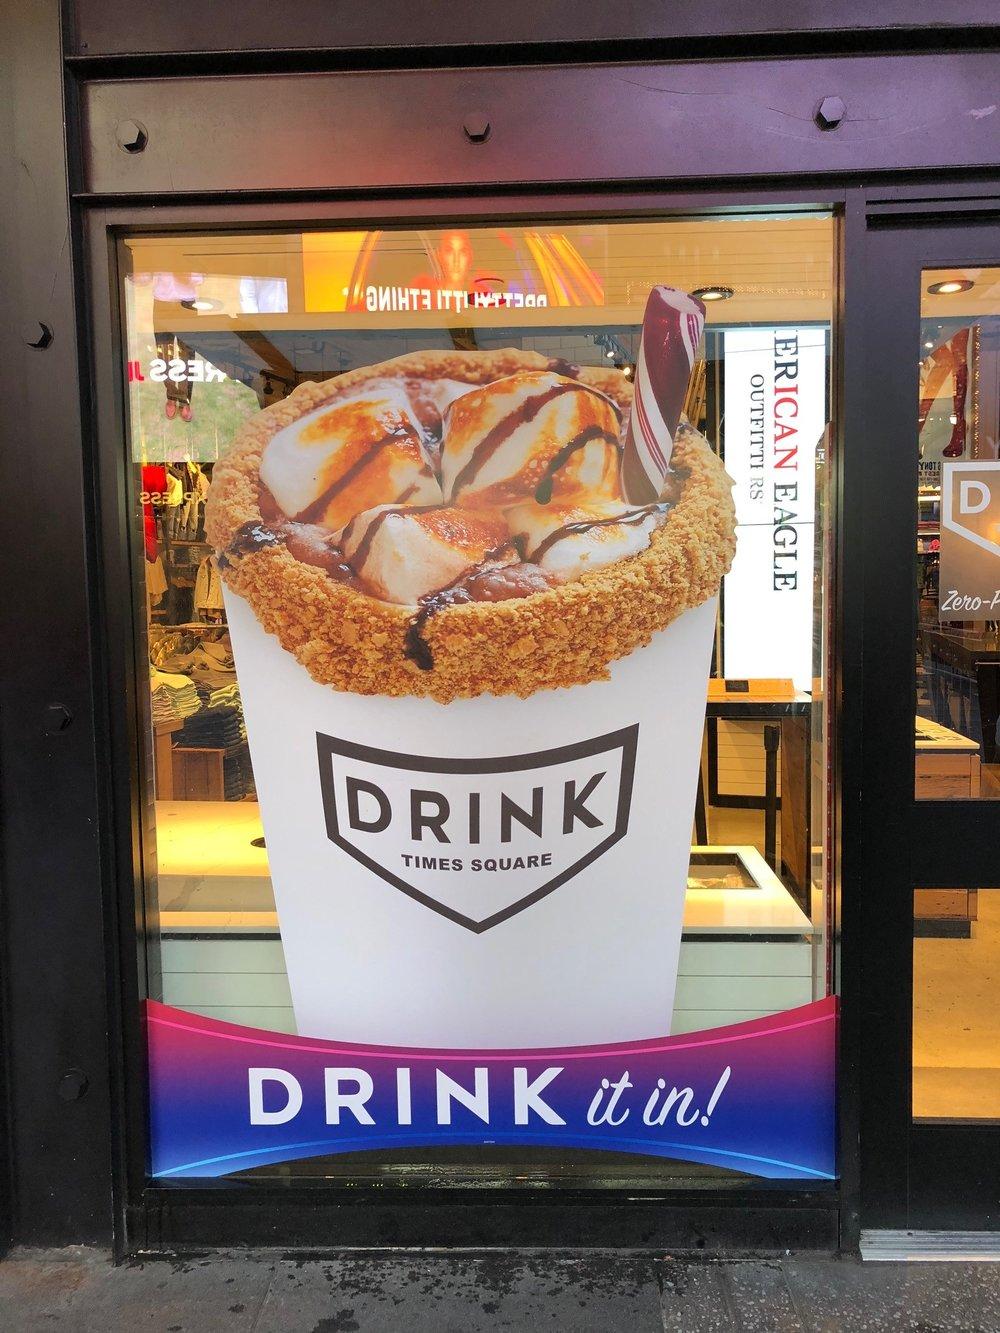 DRINK 4_11-17-17.jpg